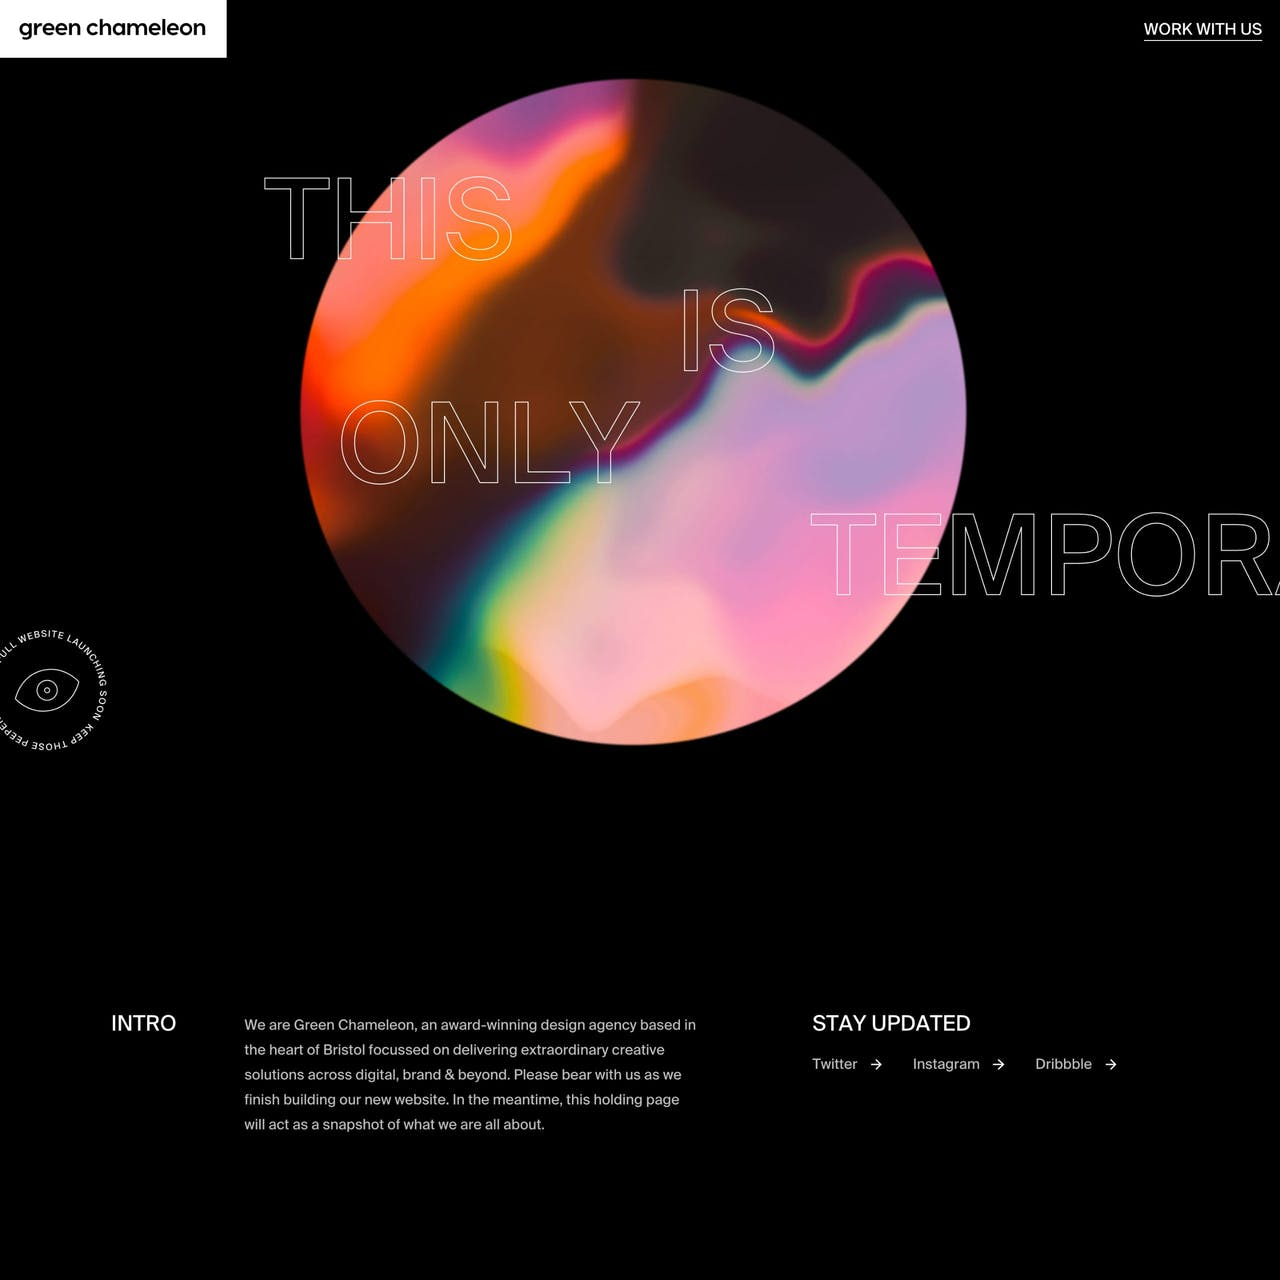 Temporary Measures Website Screenshot